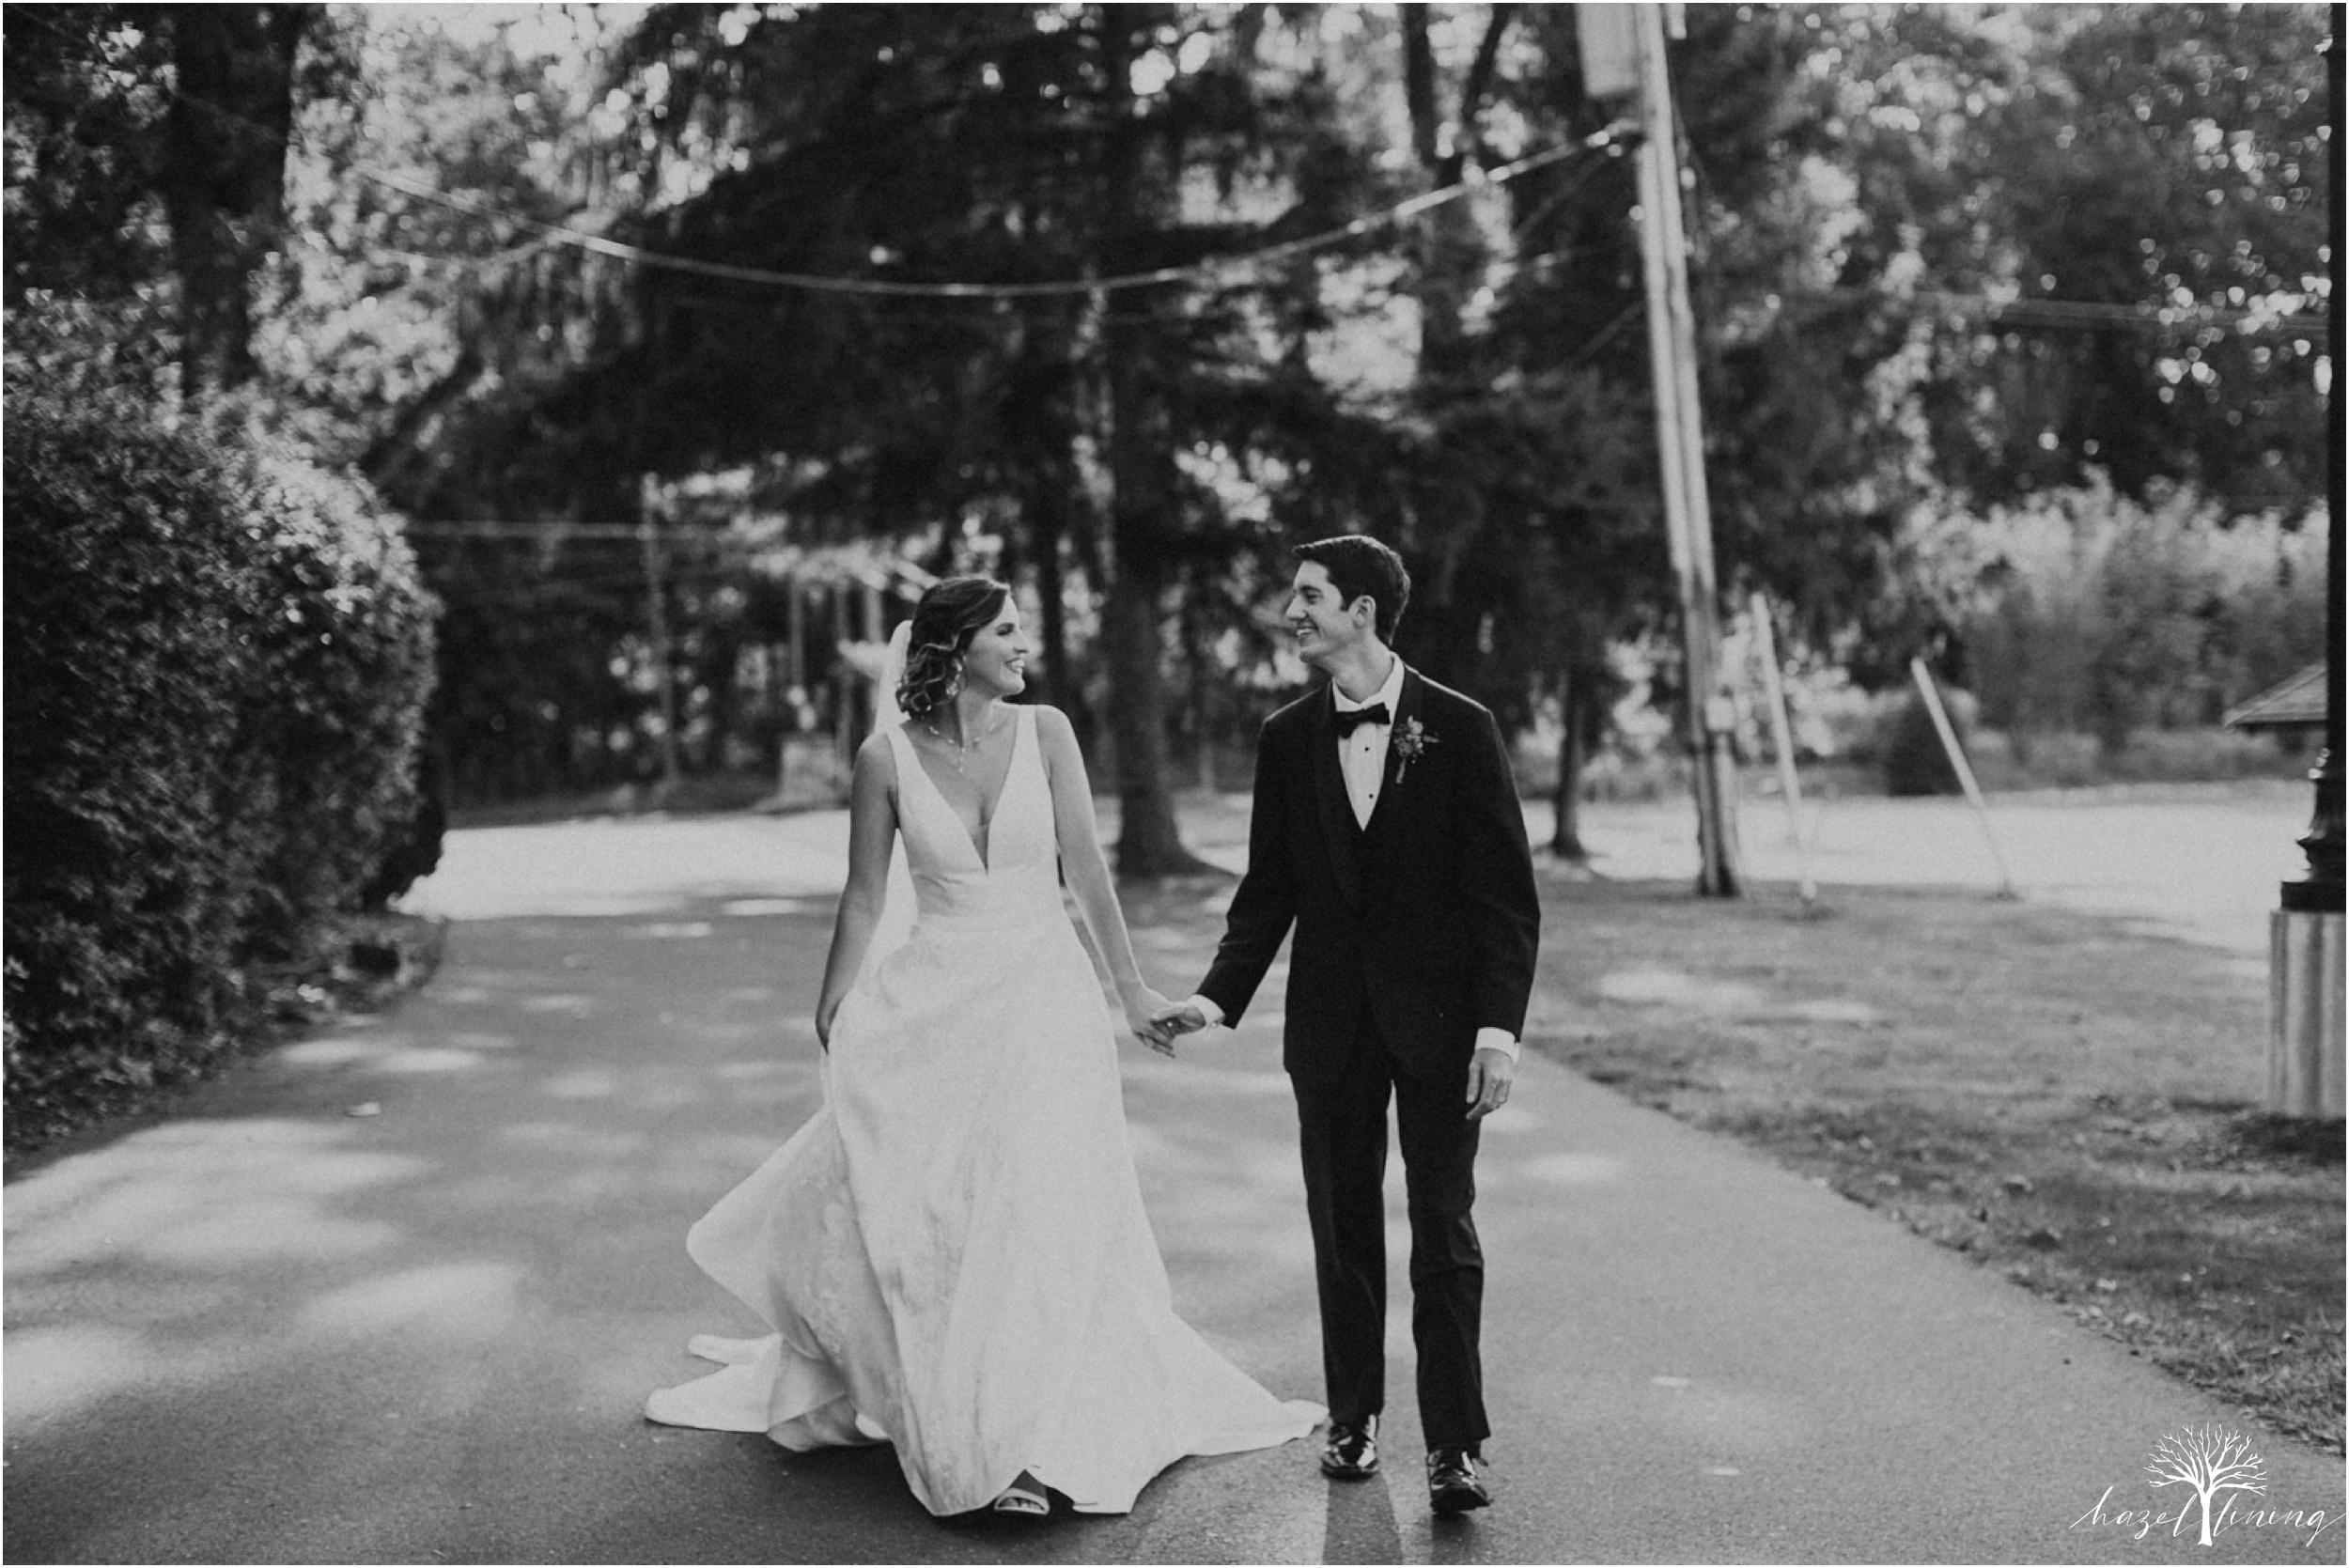 maureen-hepner-anthony-giordano-rose-bank-winery-newtow-pennsylvania-luxury-summer-wedding-hazel-lining-photography-destination-elopement-wedding-engagement-photography_0098.jpg